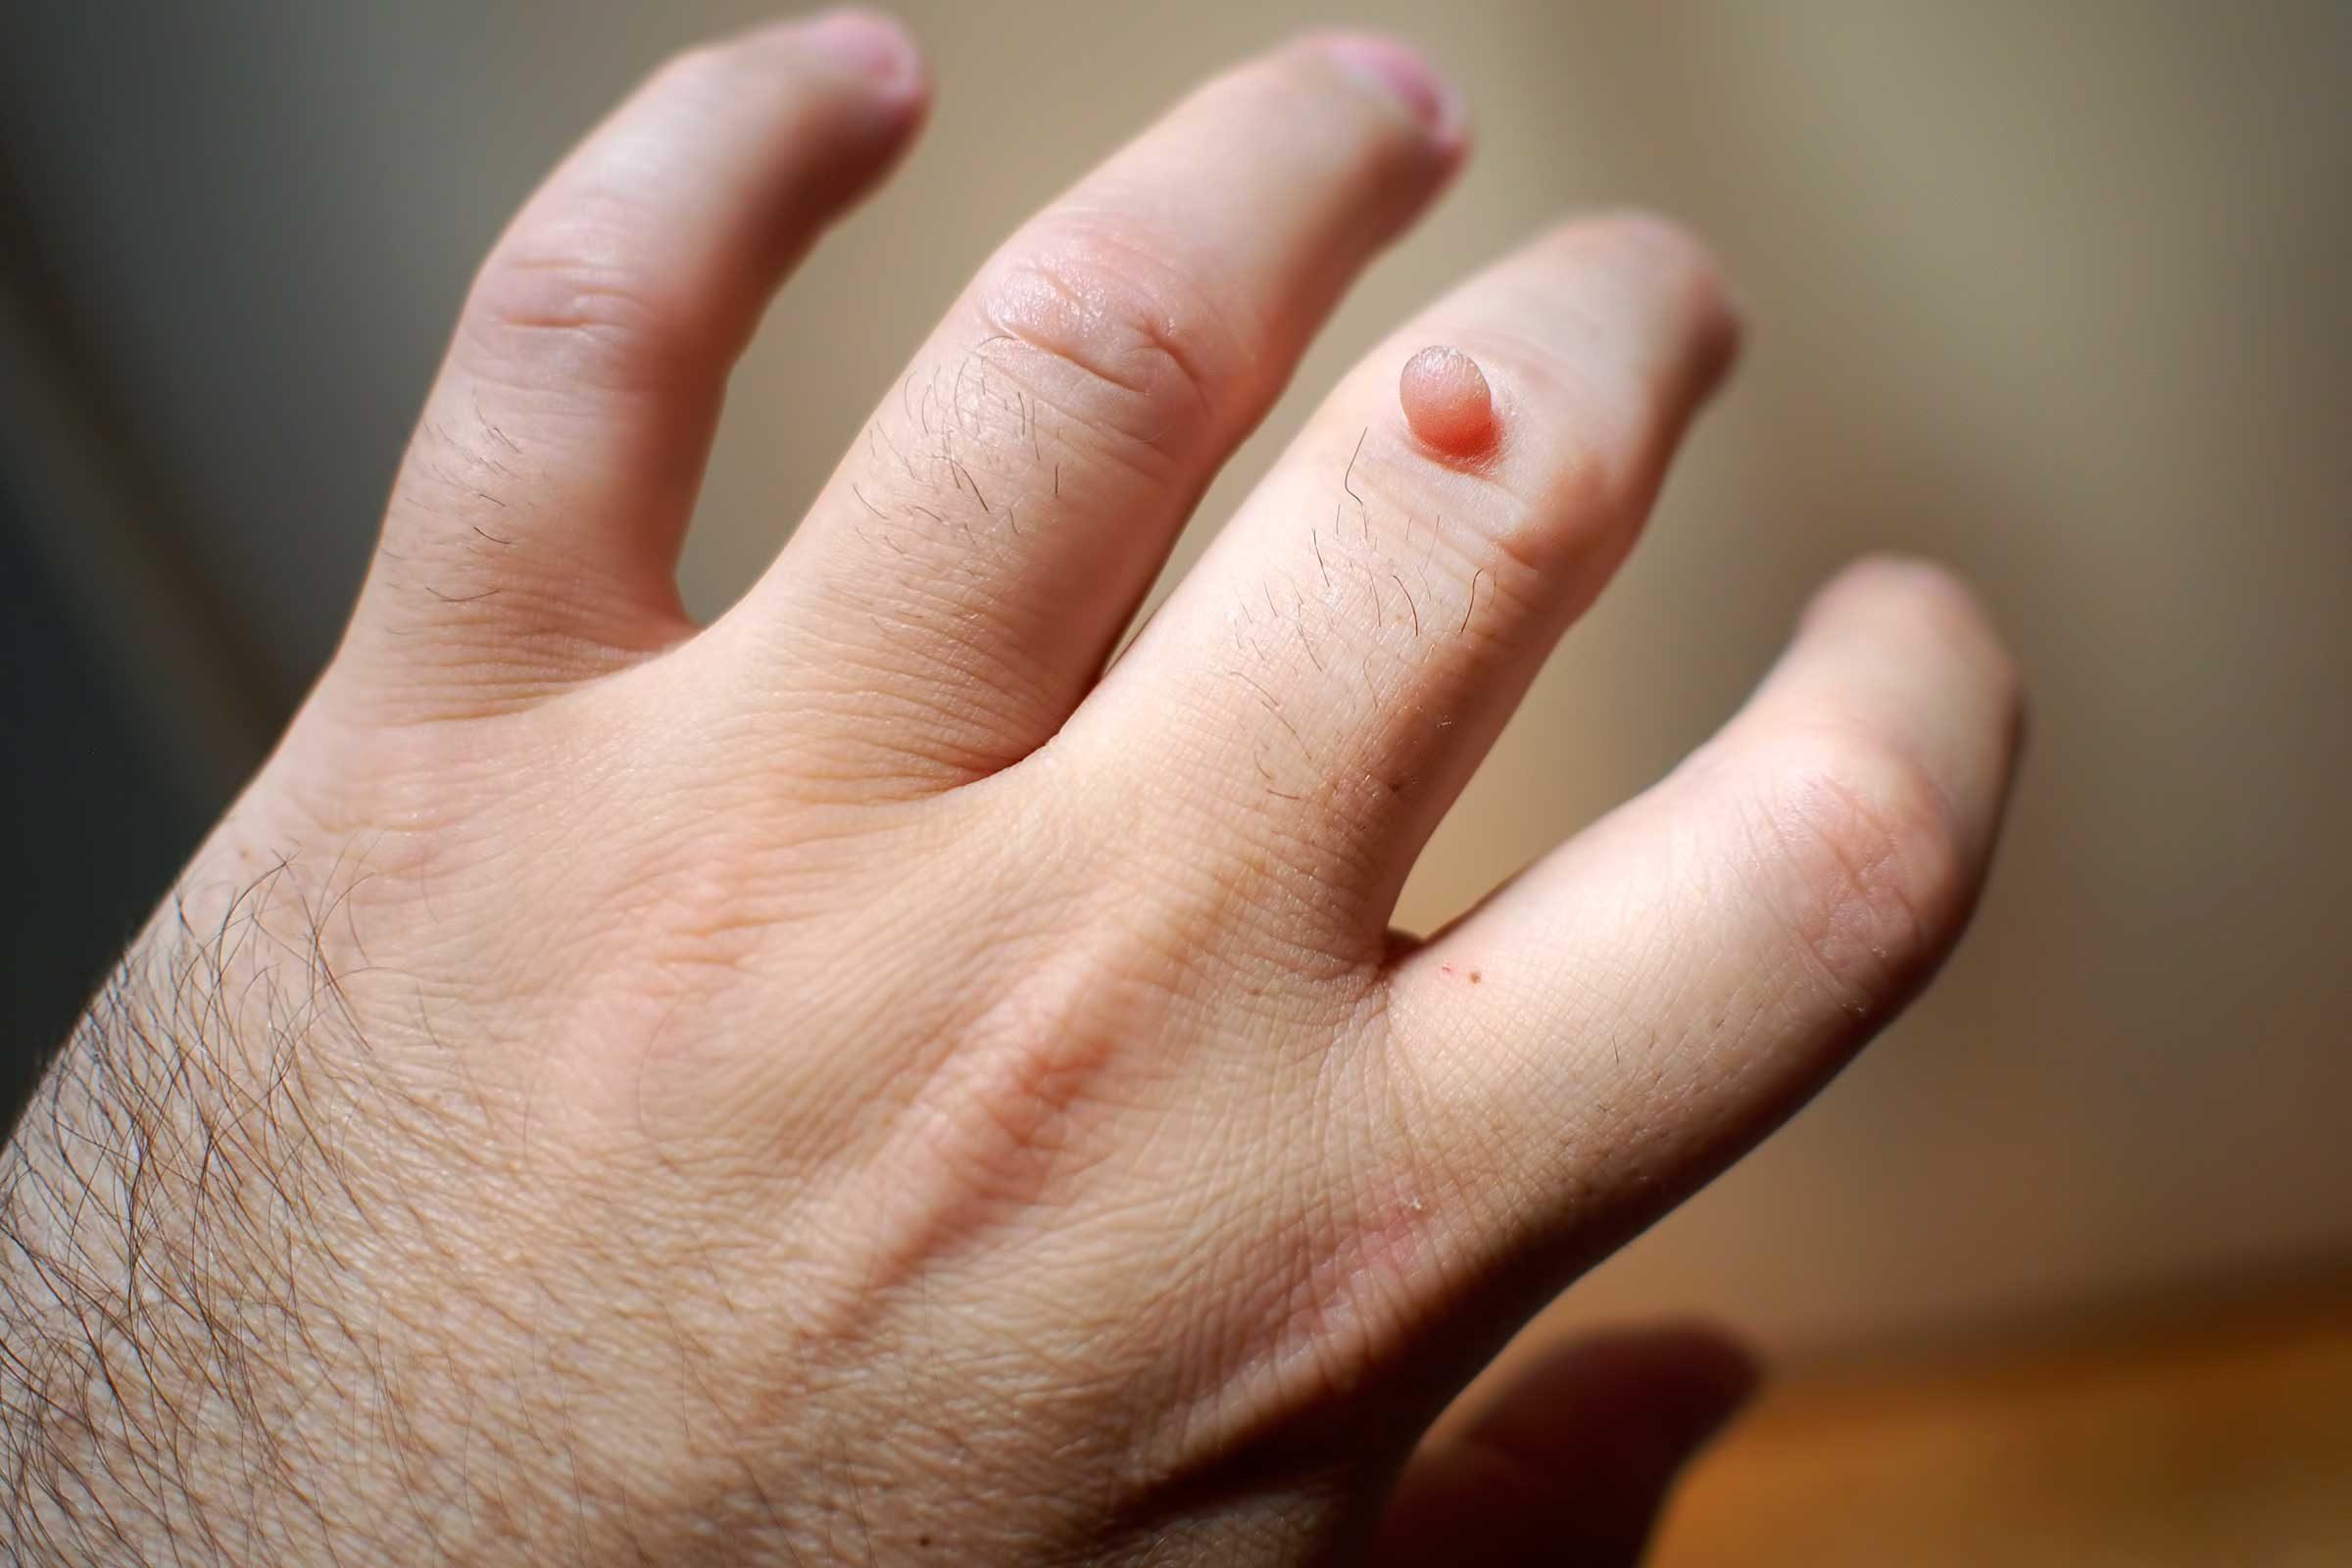 warts on hands treatment best)